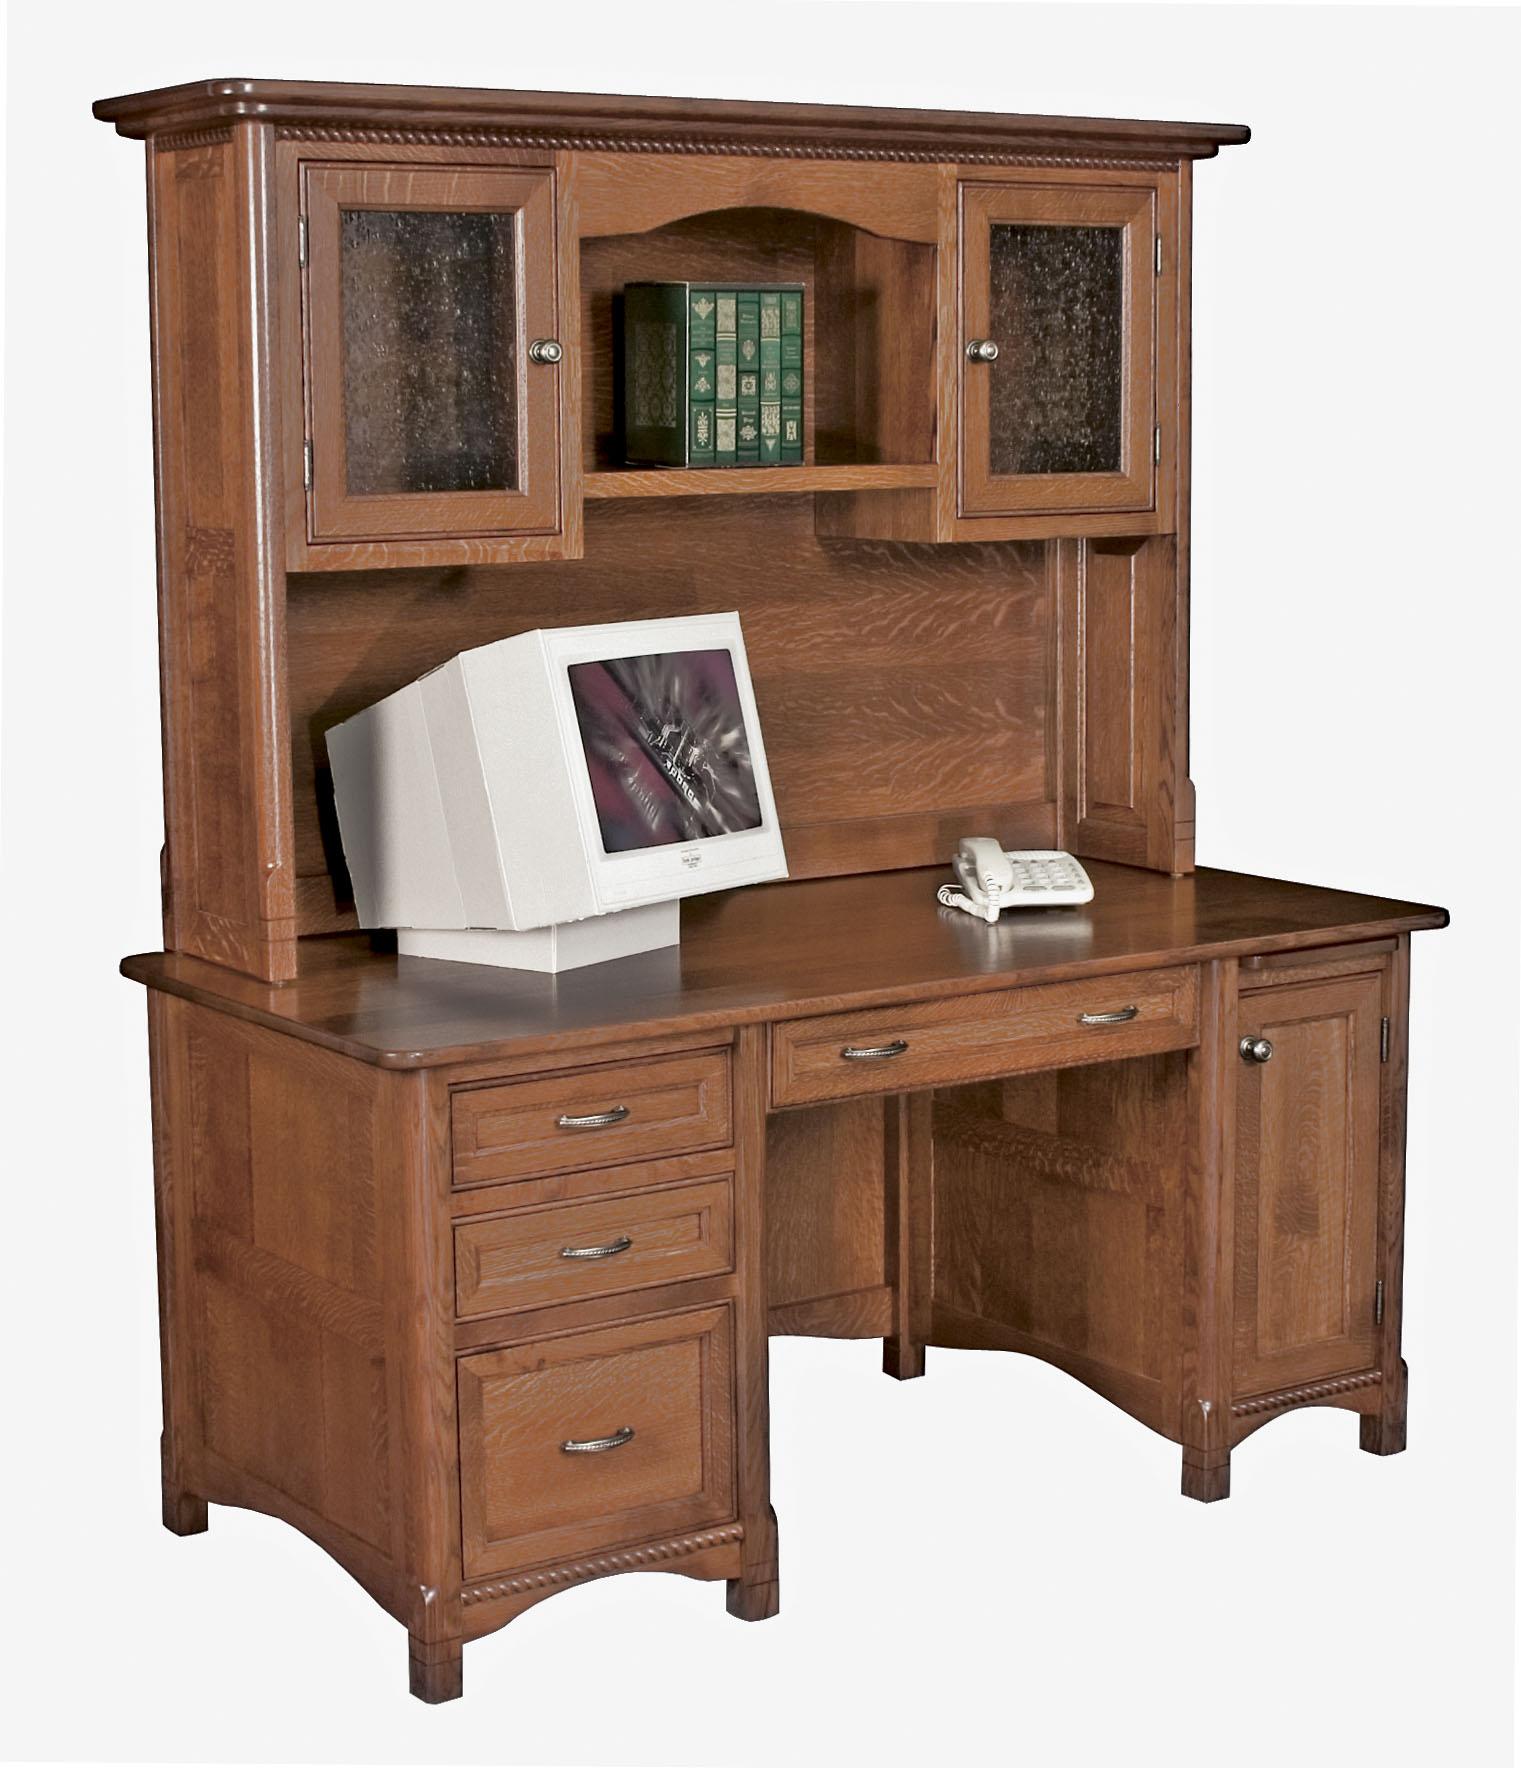 Amish Computer Secretary Desk Armoire Modesto Solid Wood: Amish Furniture Gallery In Lockport, IL